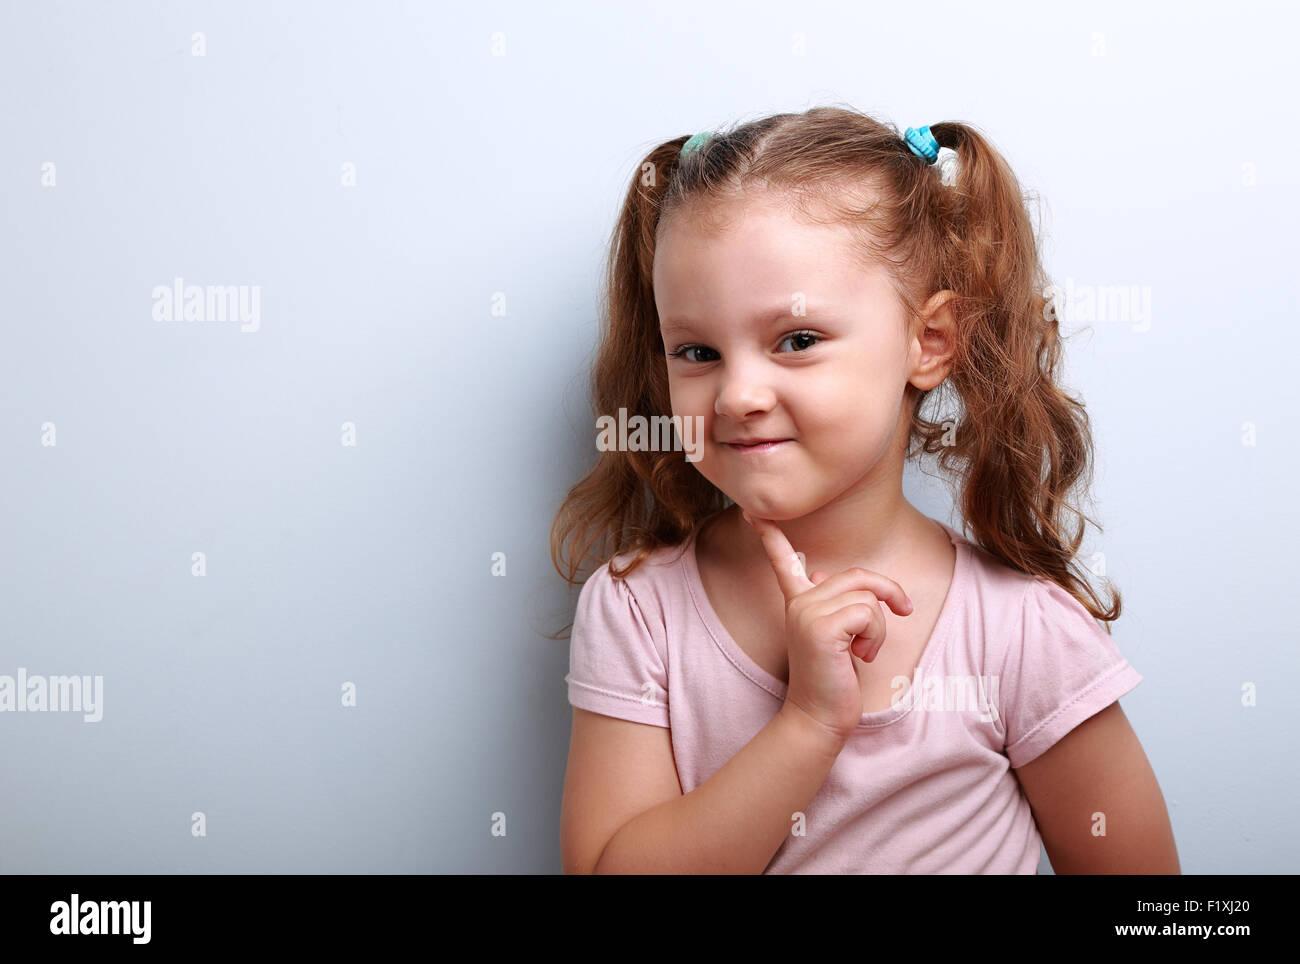 Astucia pensando en pequeño chico chica con dedo cerca de cara sobre fondo azul, con copia espacio vacío Imagen De Stock